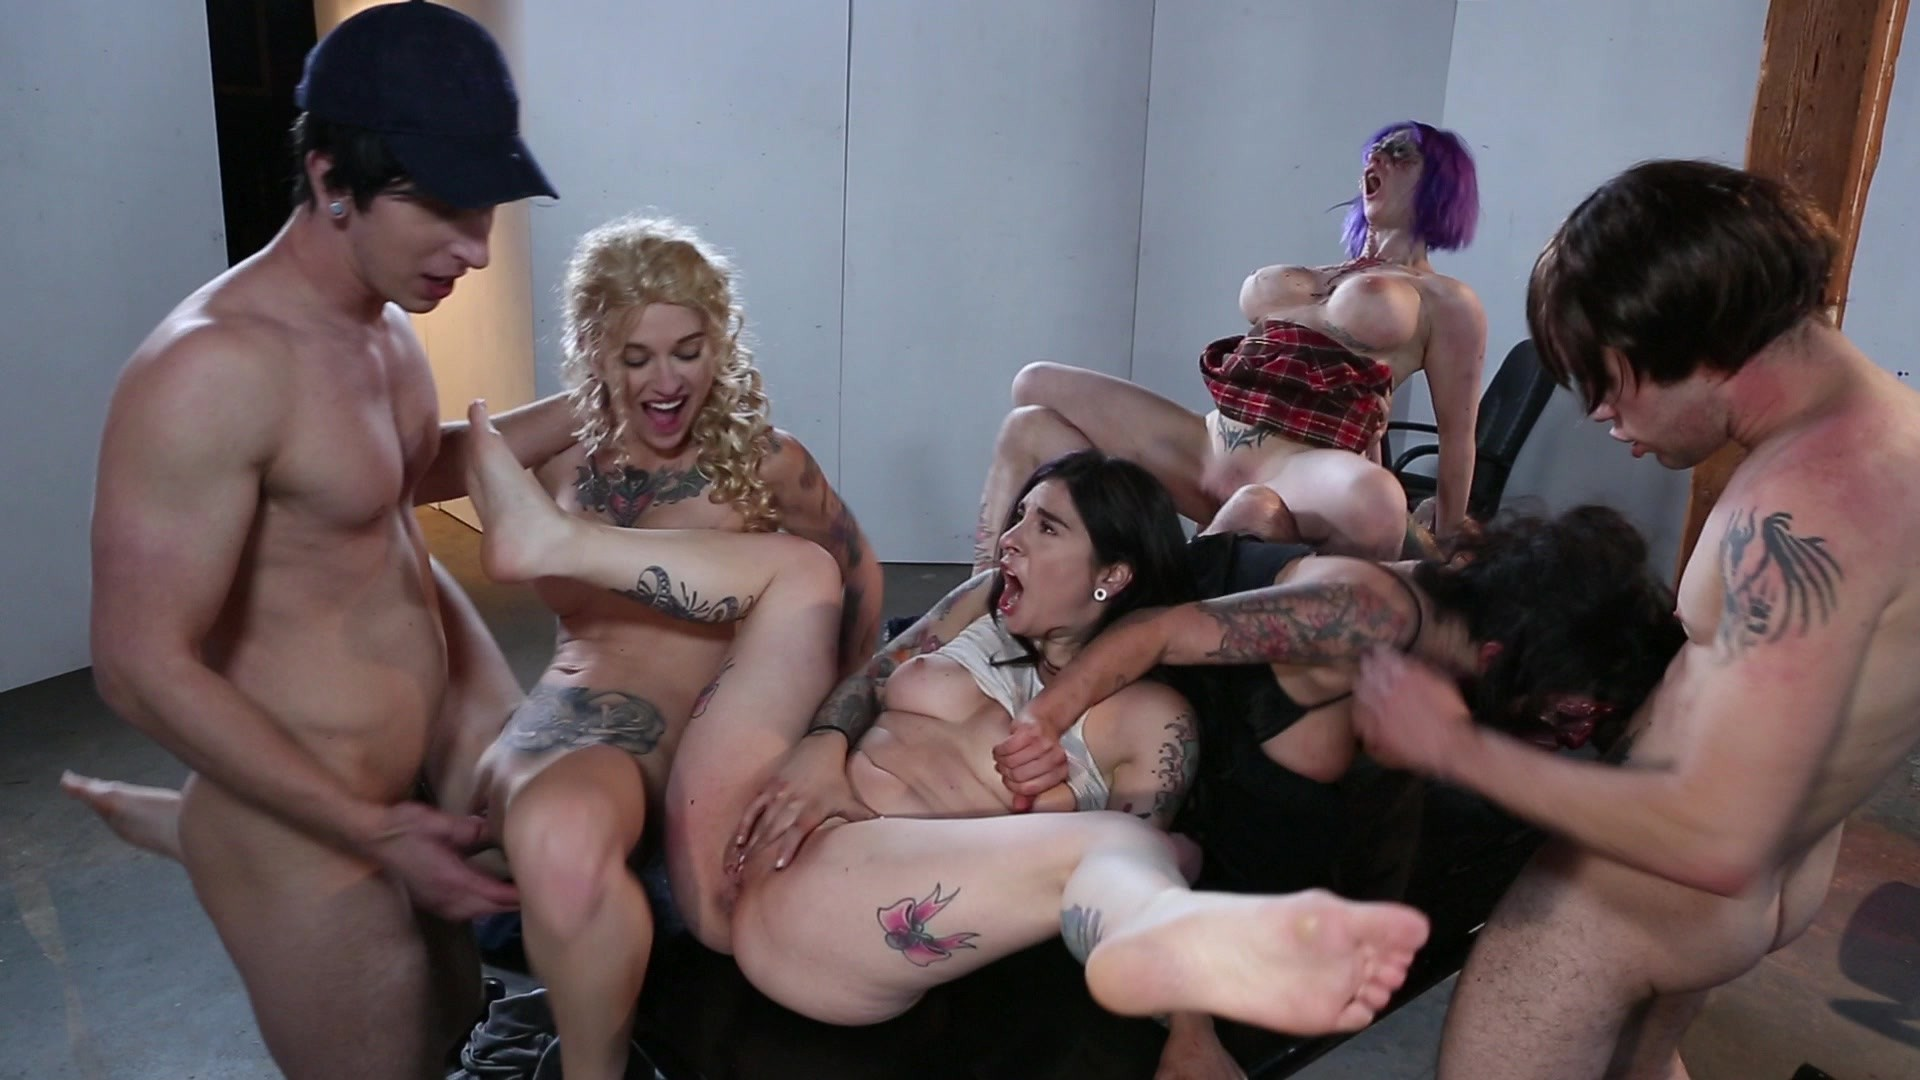 Gangbang Sex with Dead. Starring: Joanna Angel Tommy Pistol Danny Wylde Wolf Hudson Kleio Valentien Arabelle Raphael Larkin Love Length: 15 min